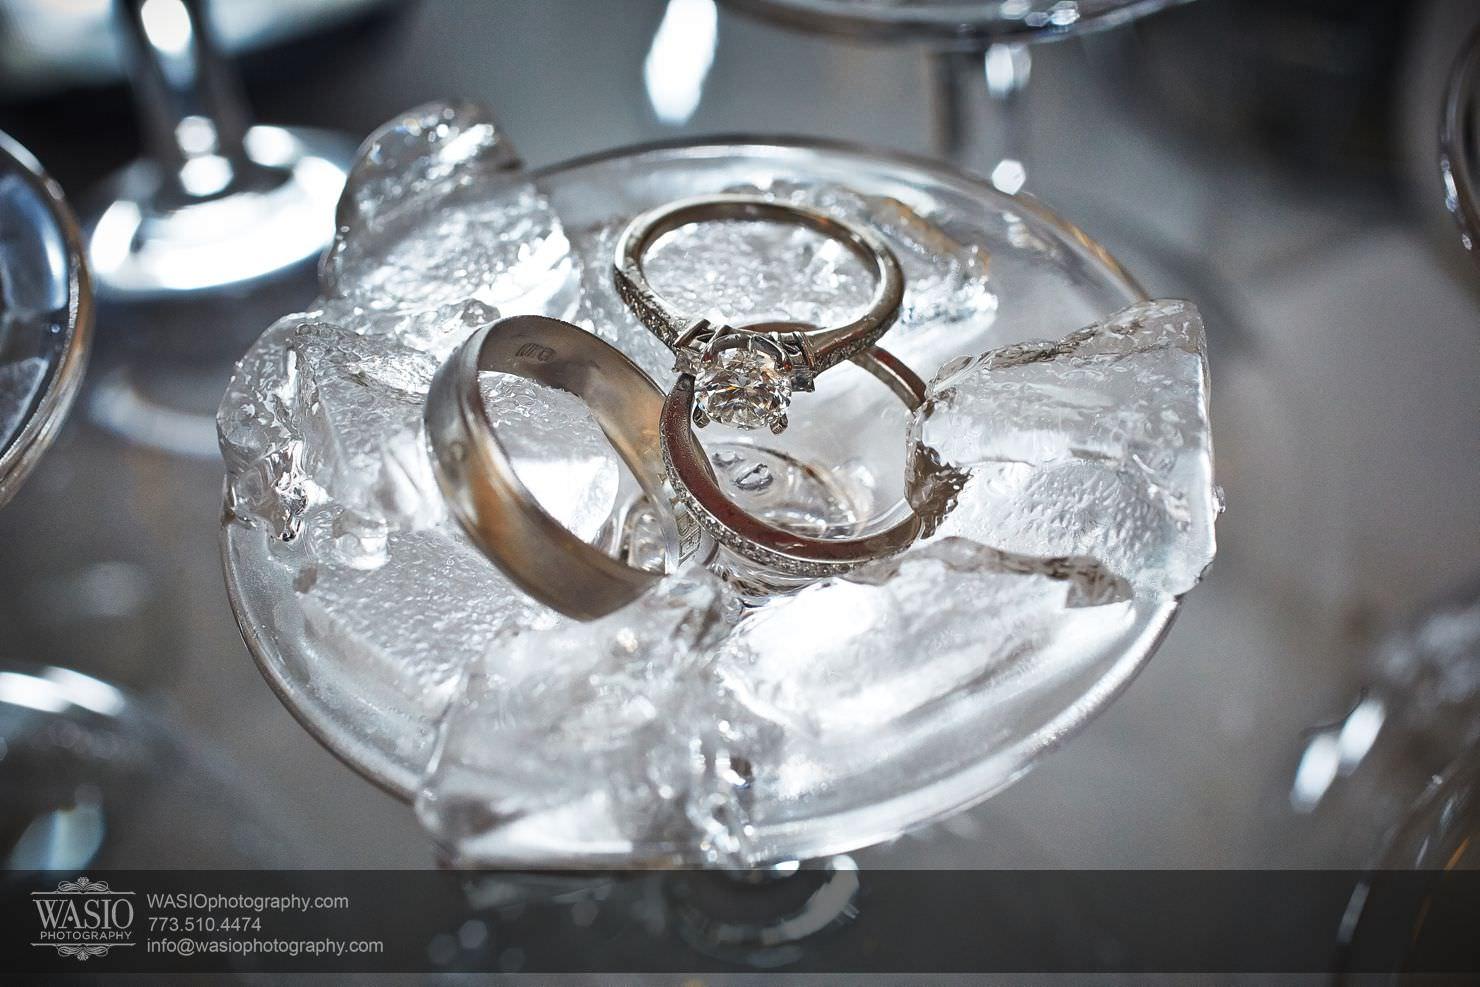 Rosemont-Fall-Wedding-wedding-band-Lauren-and-David-006 Rosemont Fall Wedding - Lauren + David